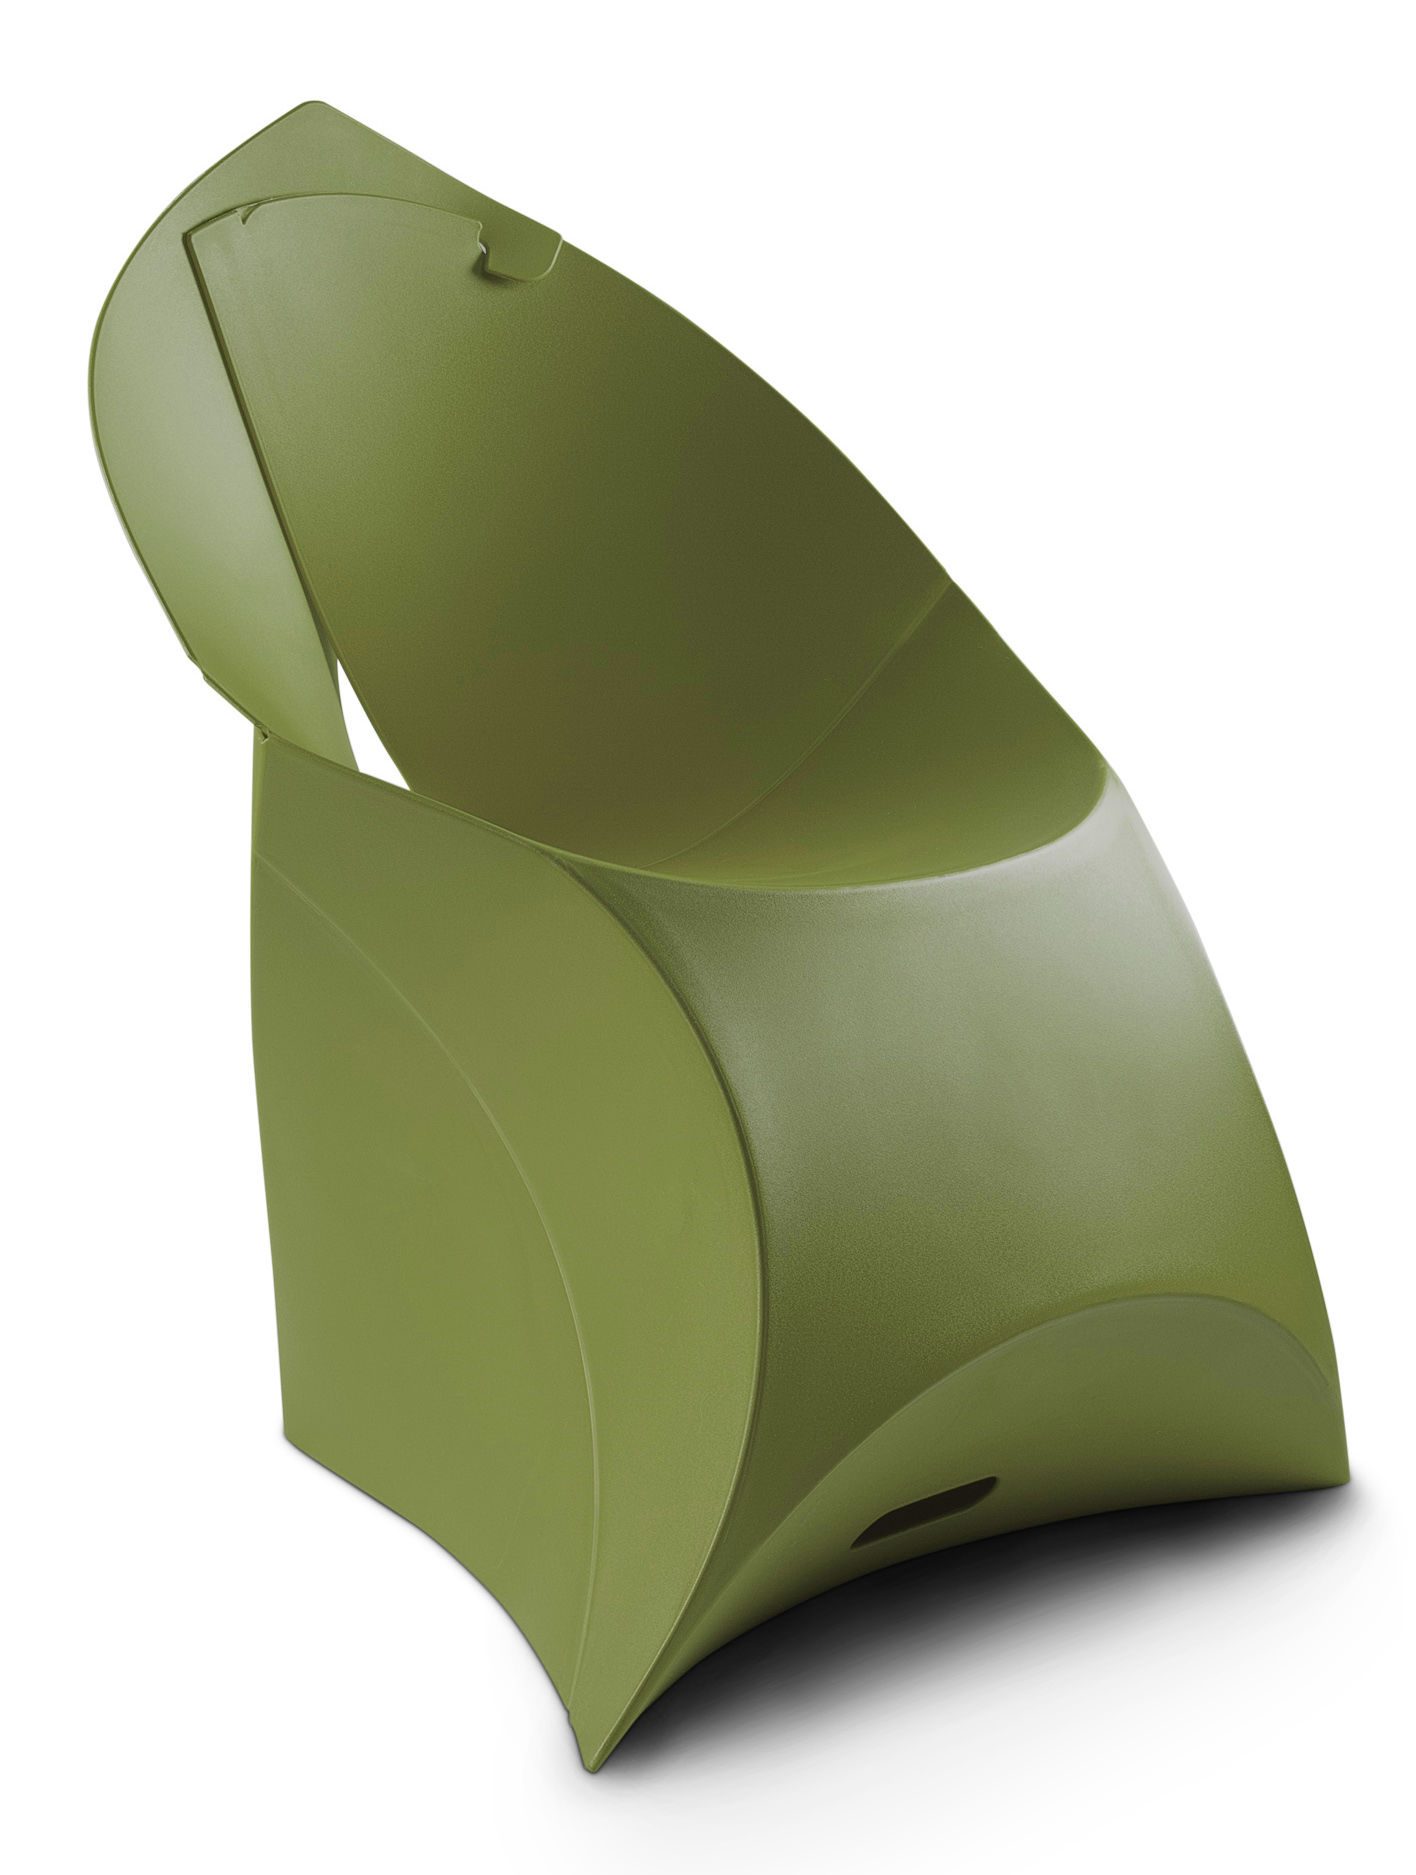 fauteuil enfant flux chair pliable kaki flux made in. Black Bedroom Furniture Sets. Home Design Ideas